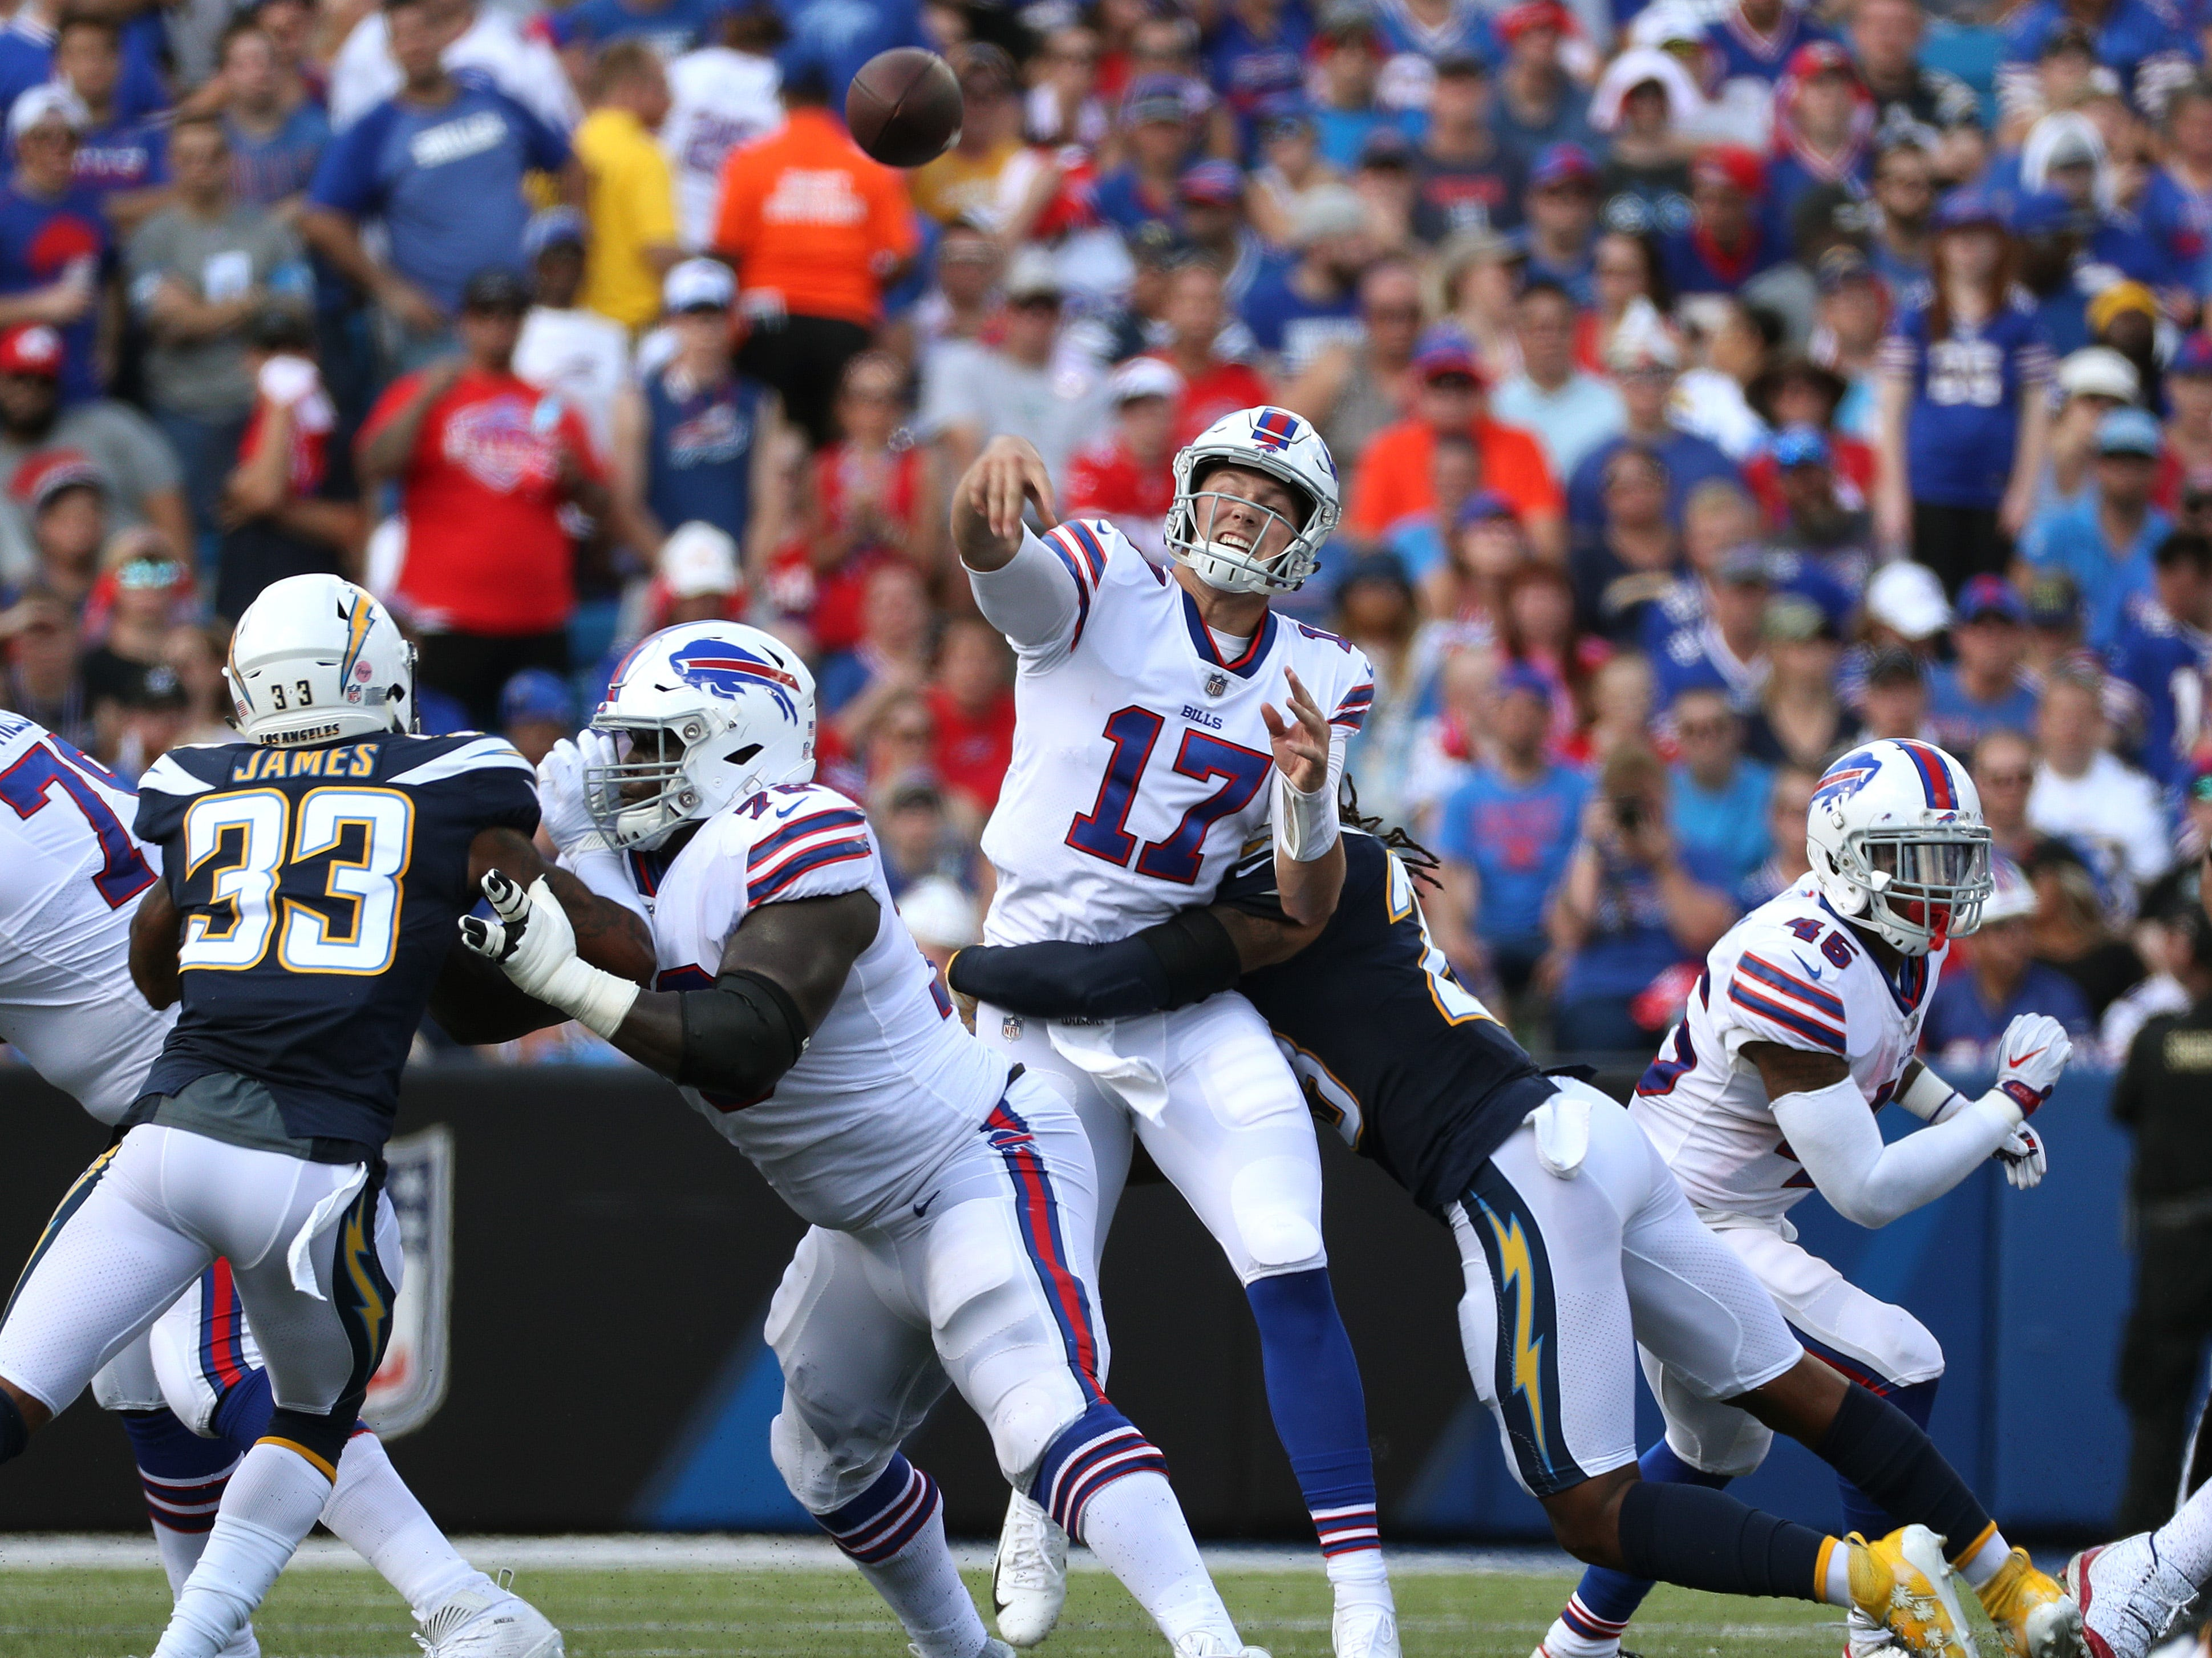 Bills quarterback Josh Allen delivers a pass as he is hit.